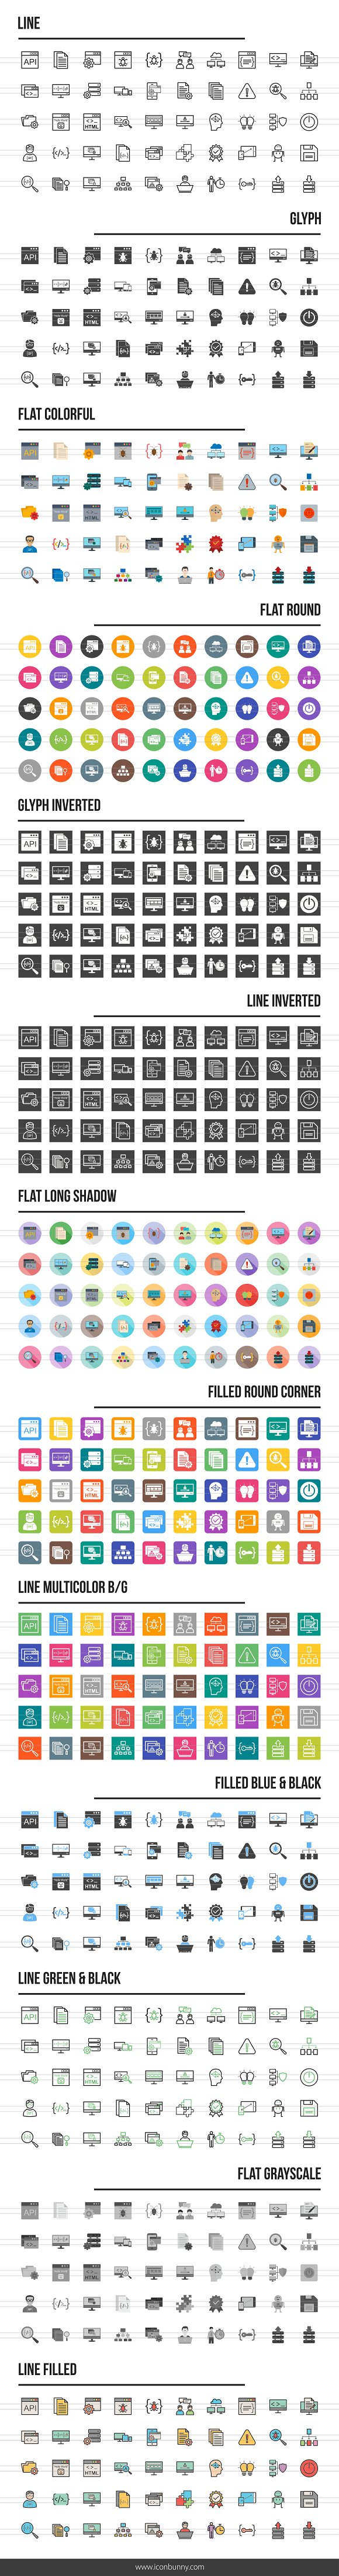 650 Software Development Icons